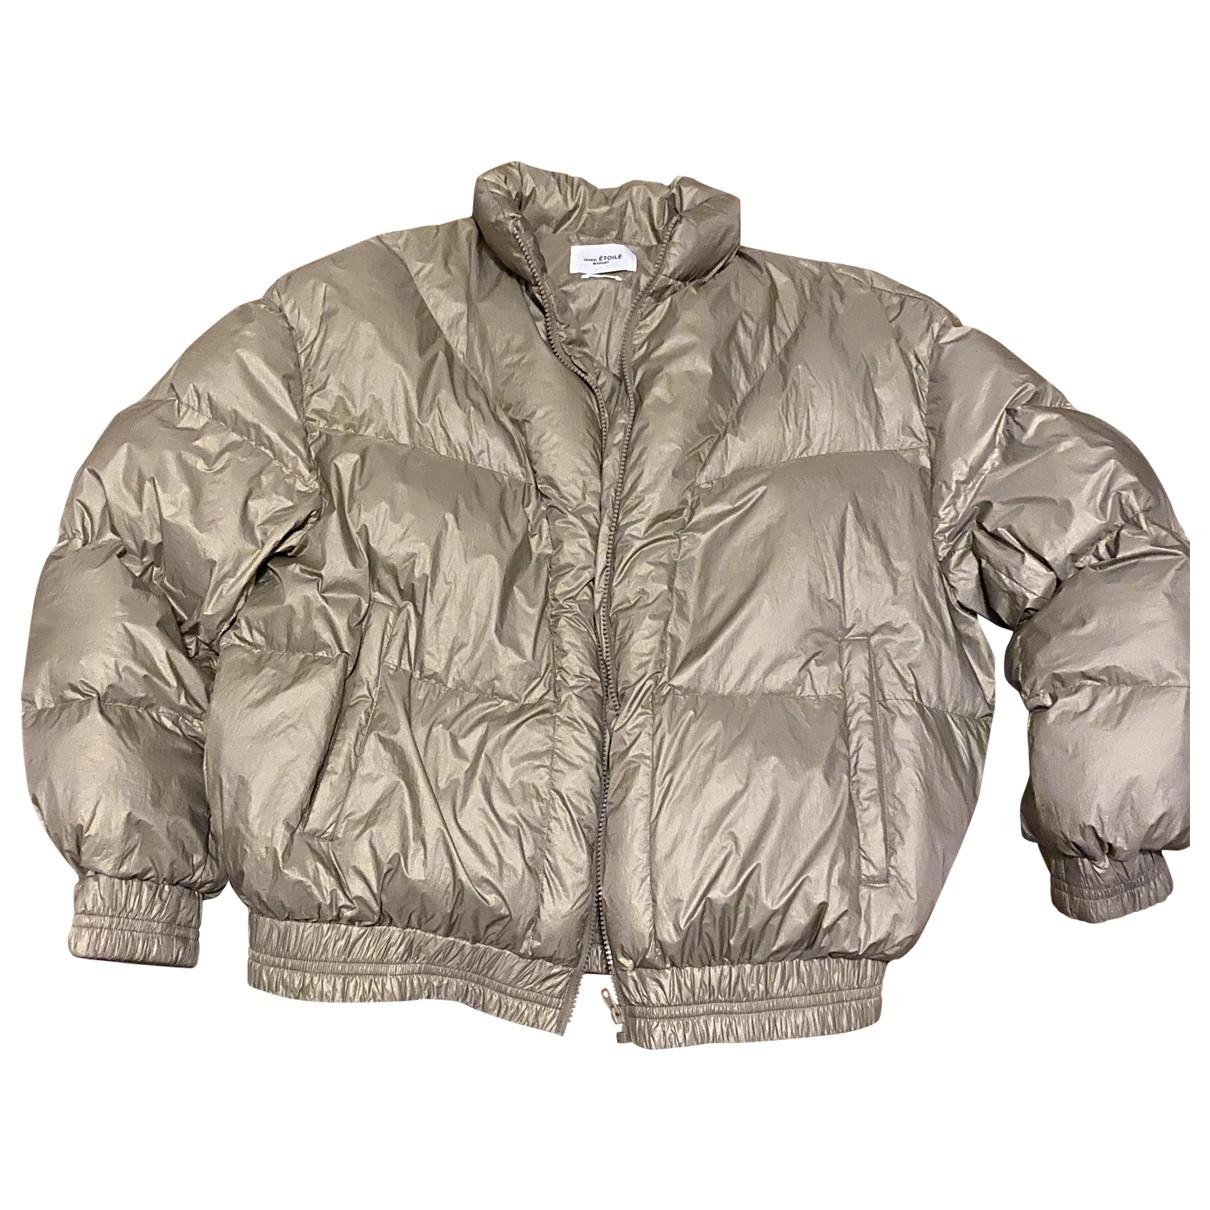 Isabel Marant Etoile N Beige Leather jacket for Women 38 FR